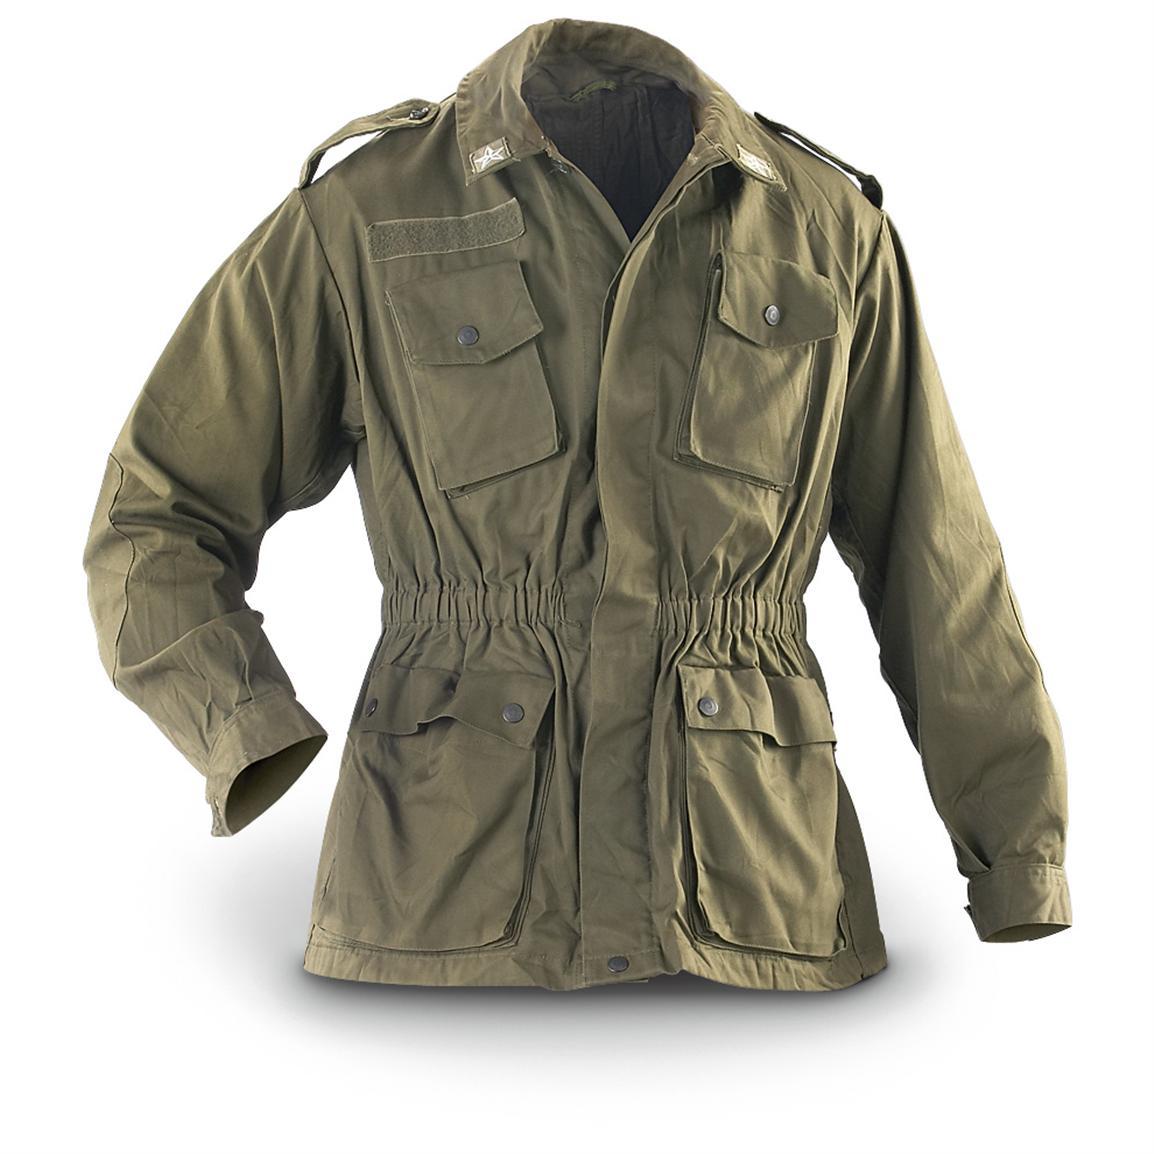 military jacket 2 used italian military combat jackets, olive drab qxstwjs